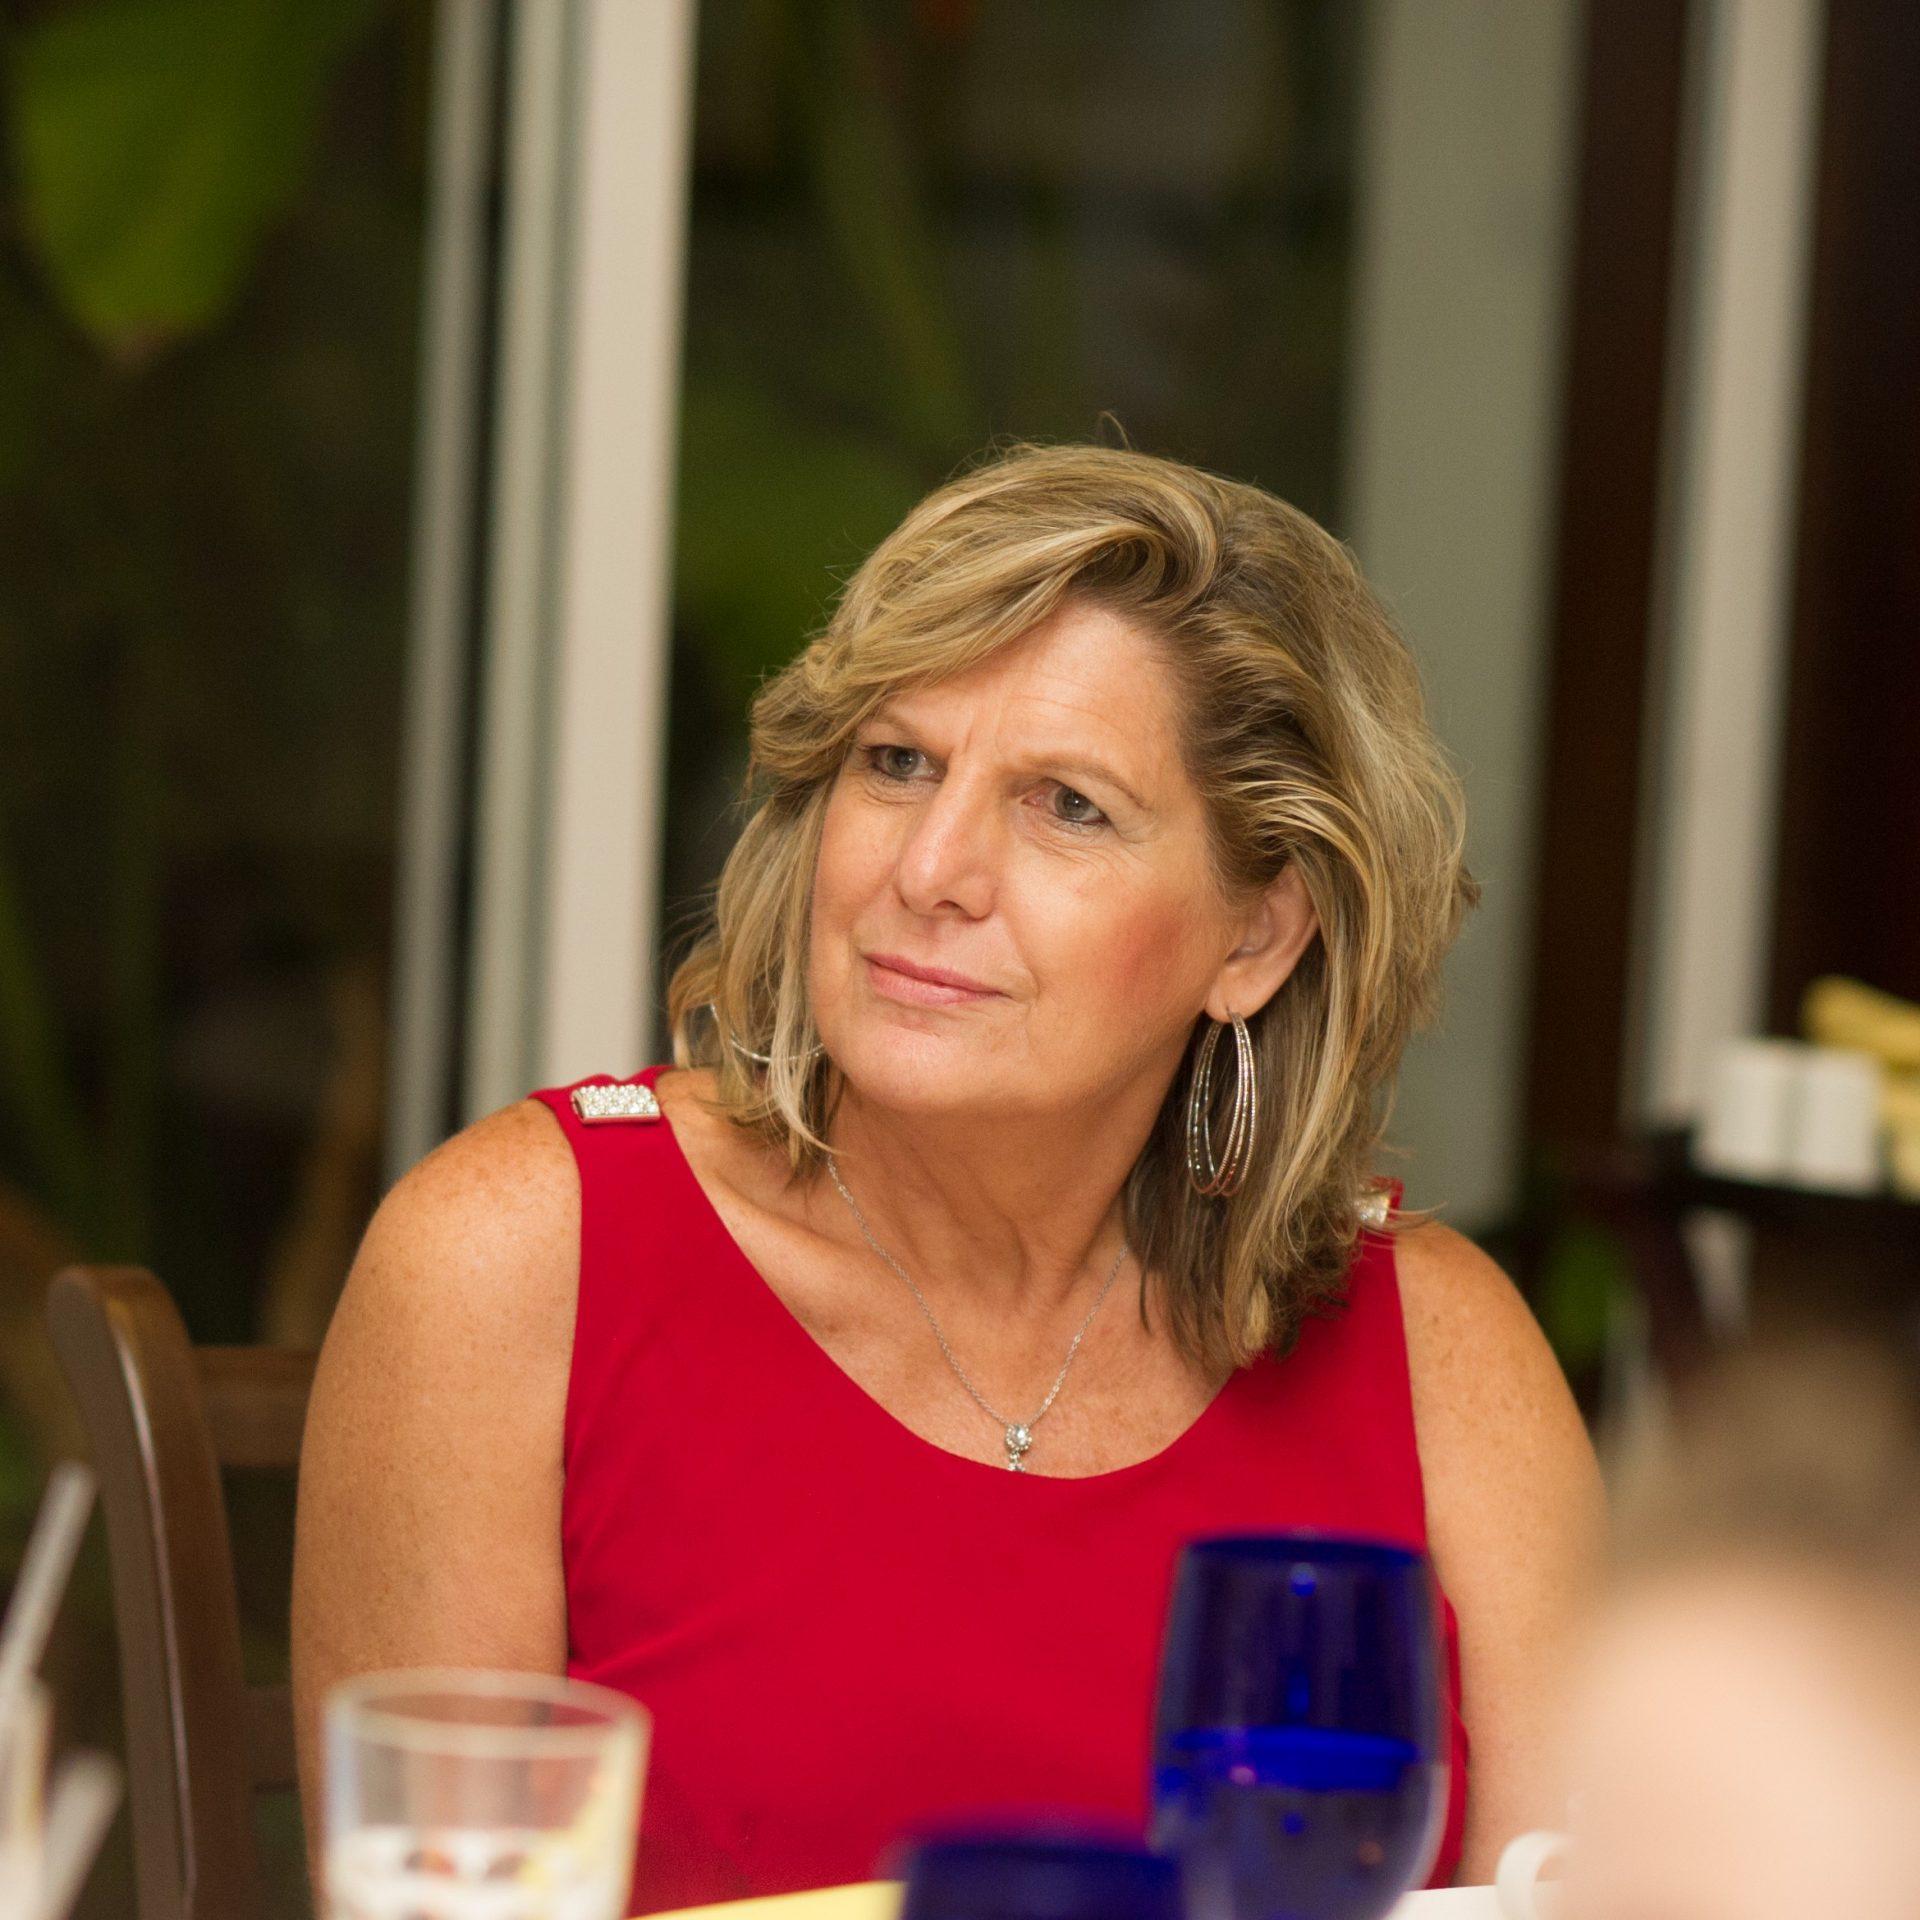 Inge in Jamaica for Jen's Wedding